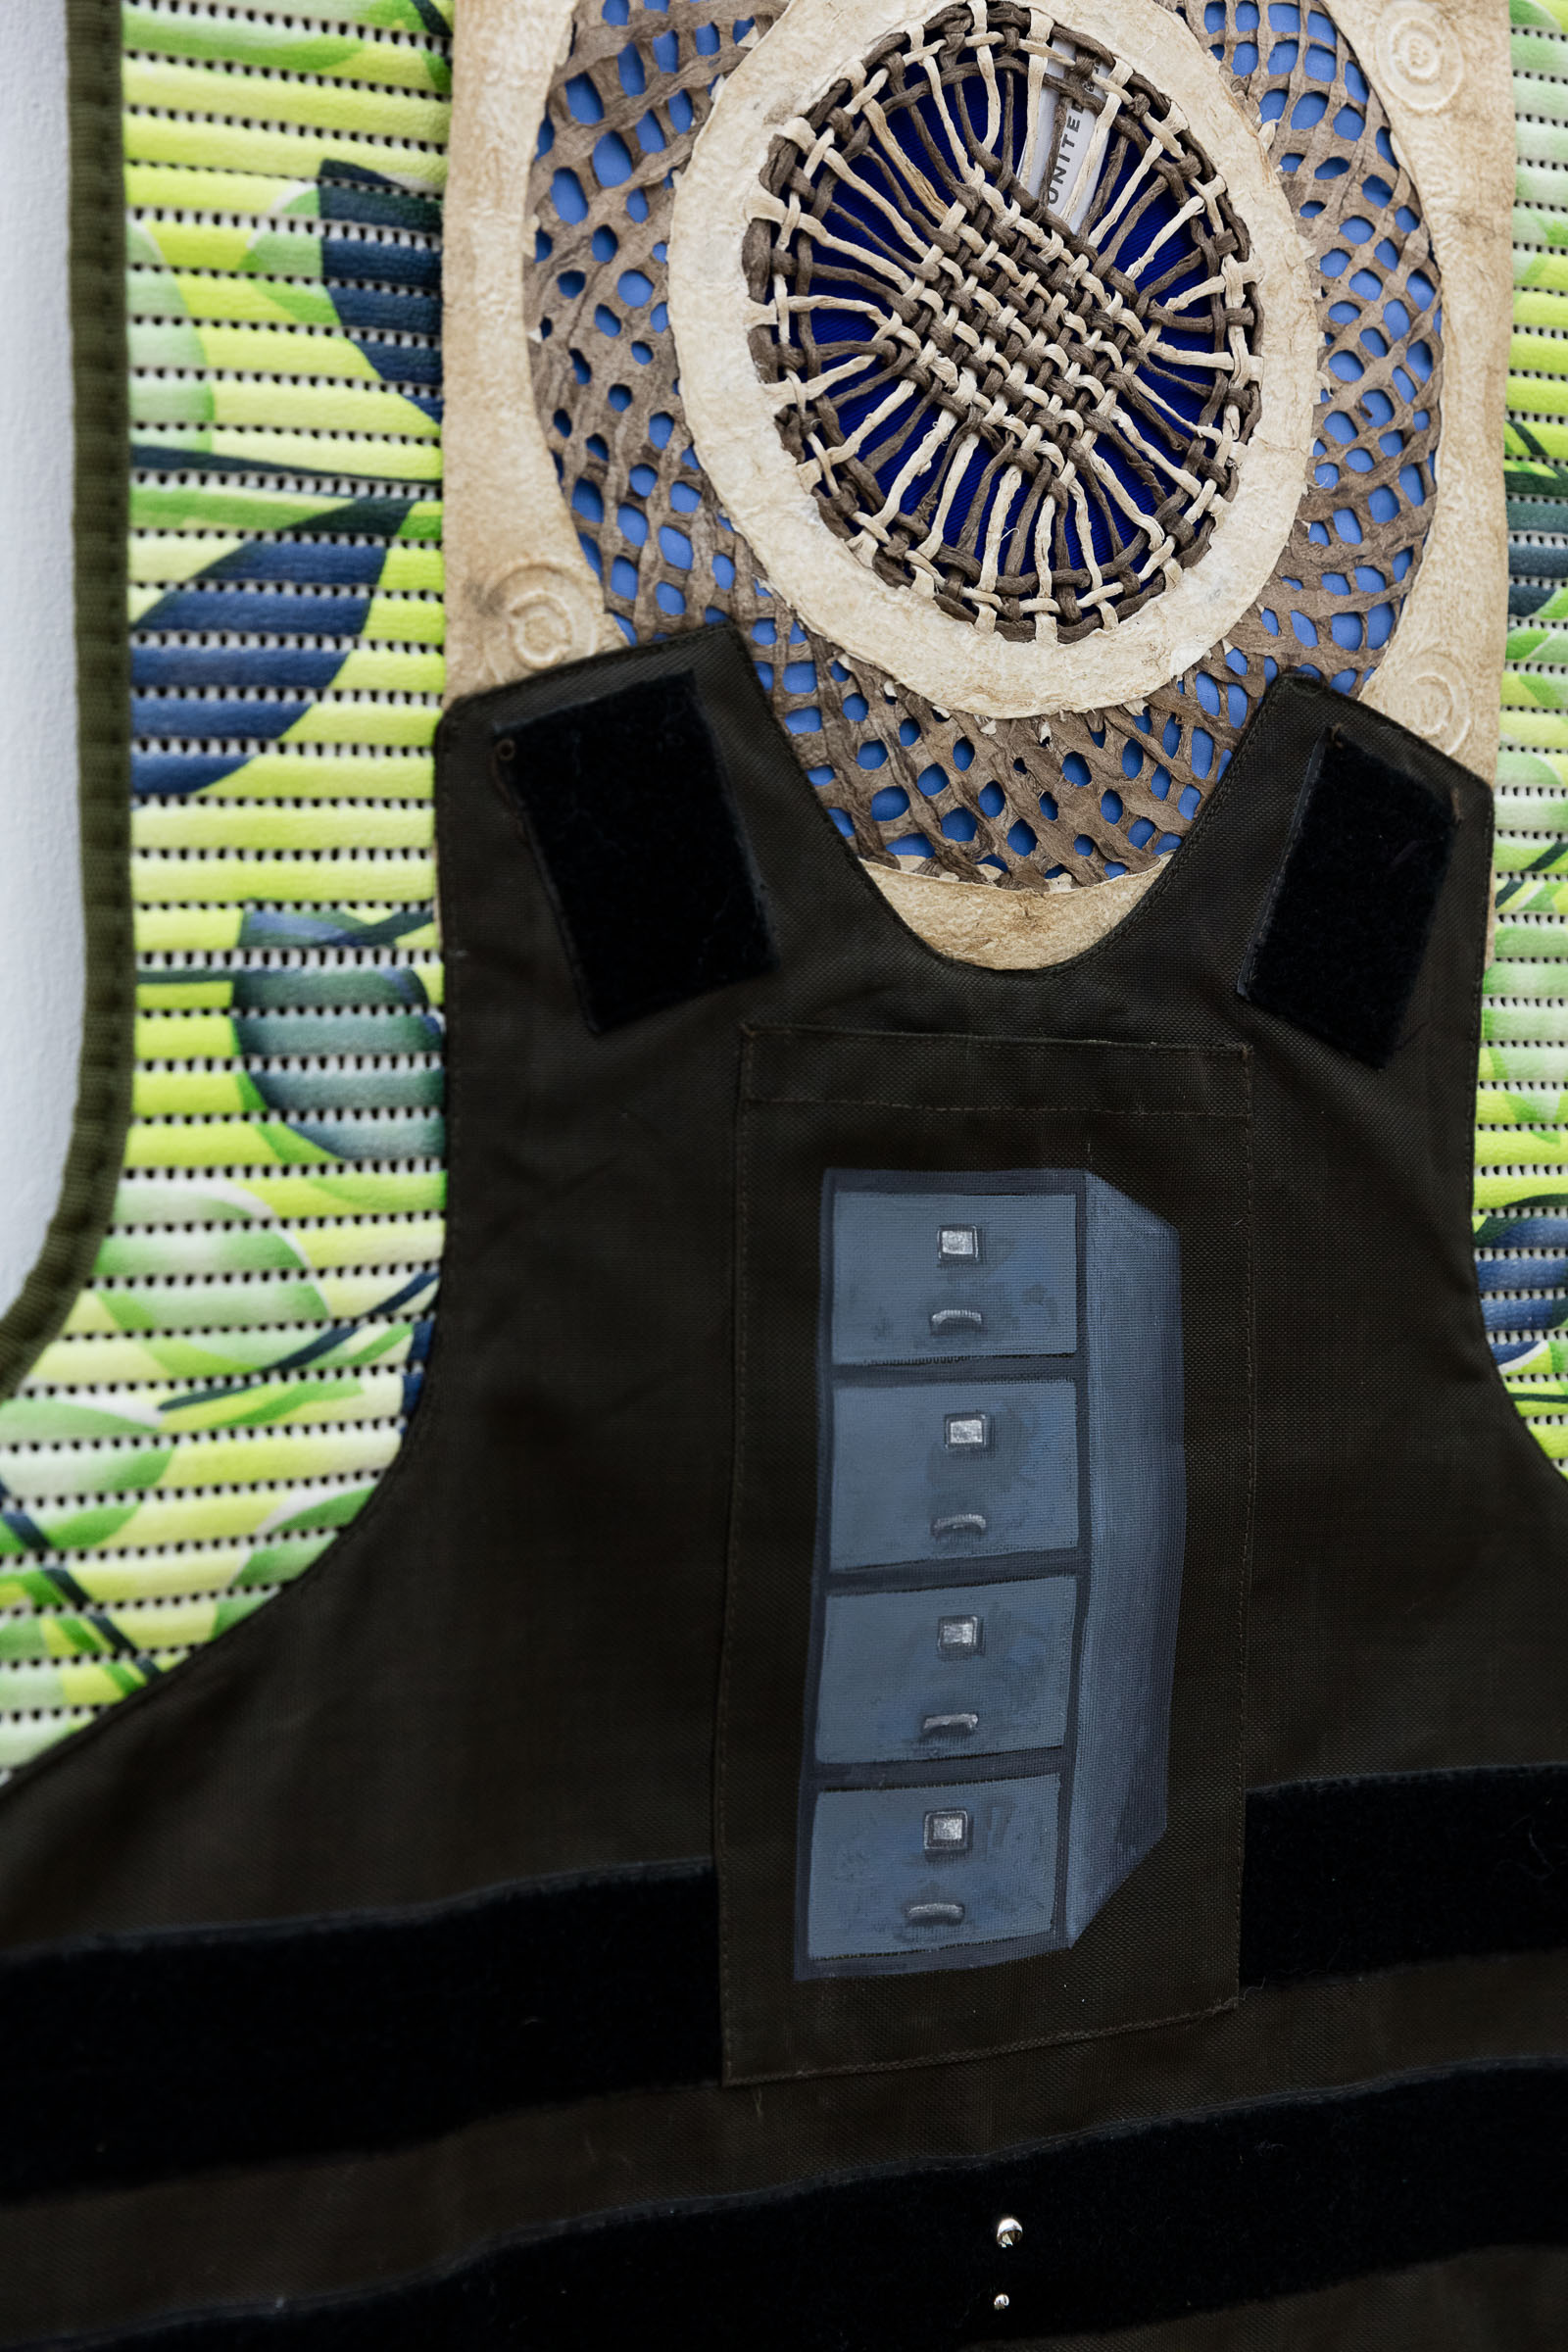 Ana Navas; United (detail), 2018; mat, plaster, textile, paper, metal; 193 x 65 cm